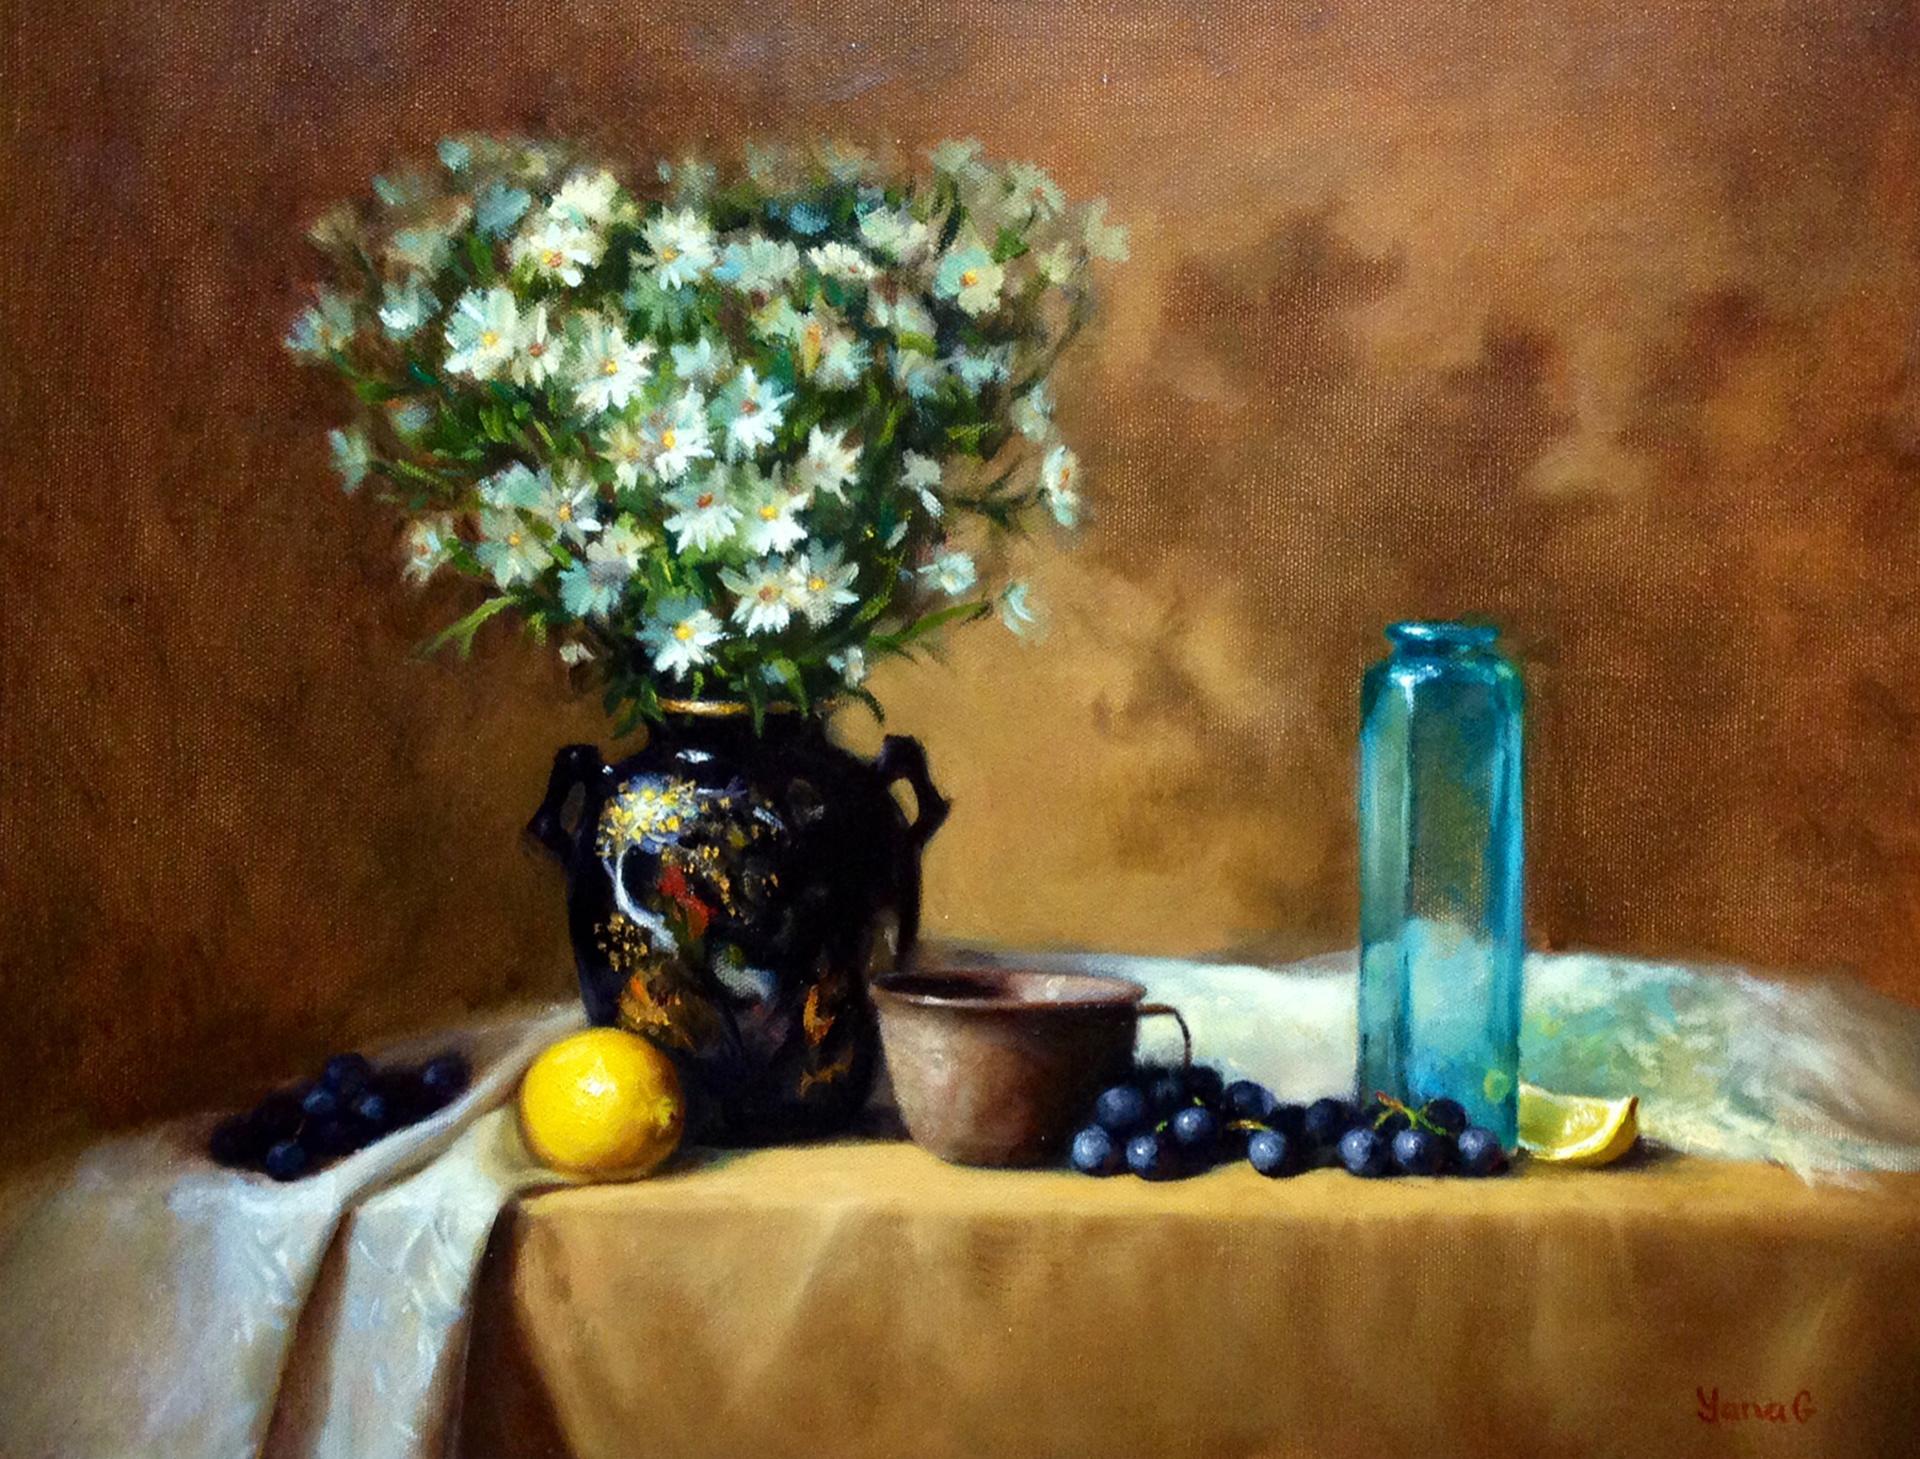 Daisies 16x20 Oil on canvas